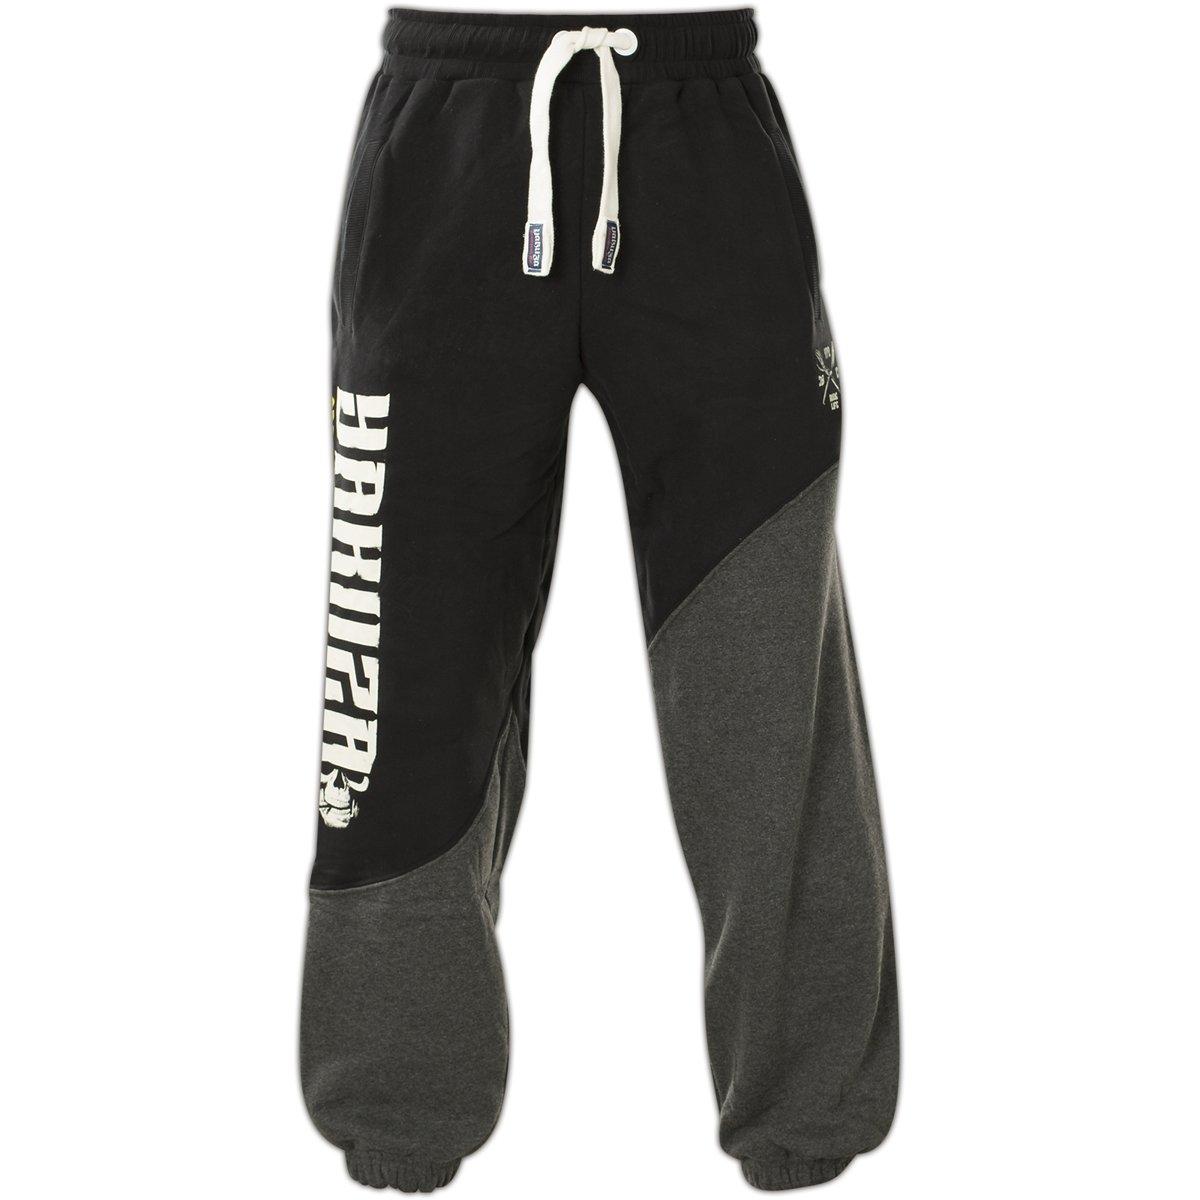 Yakuza Premium Jogginghose YPJO-2330 Schwarz